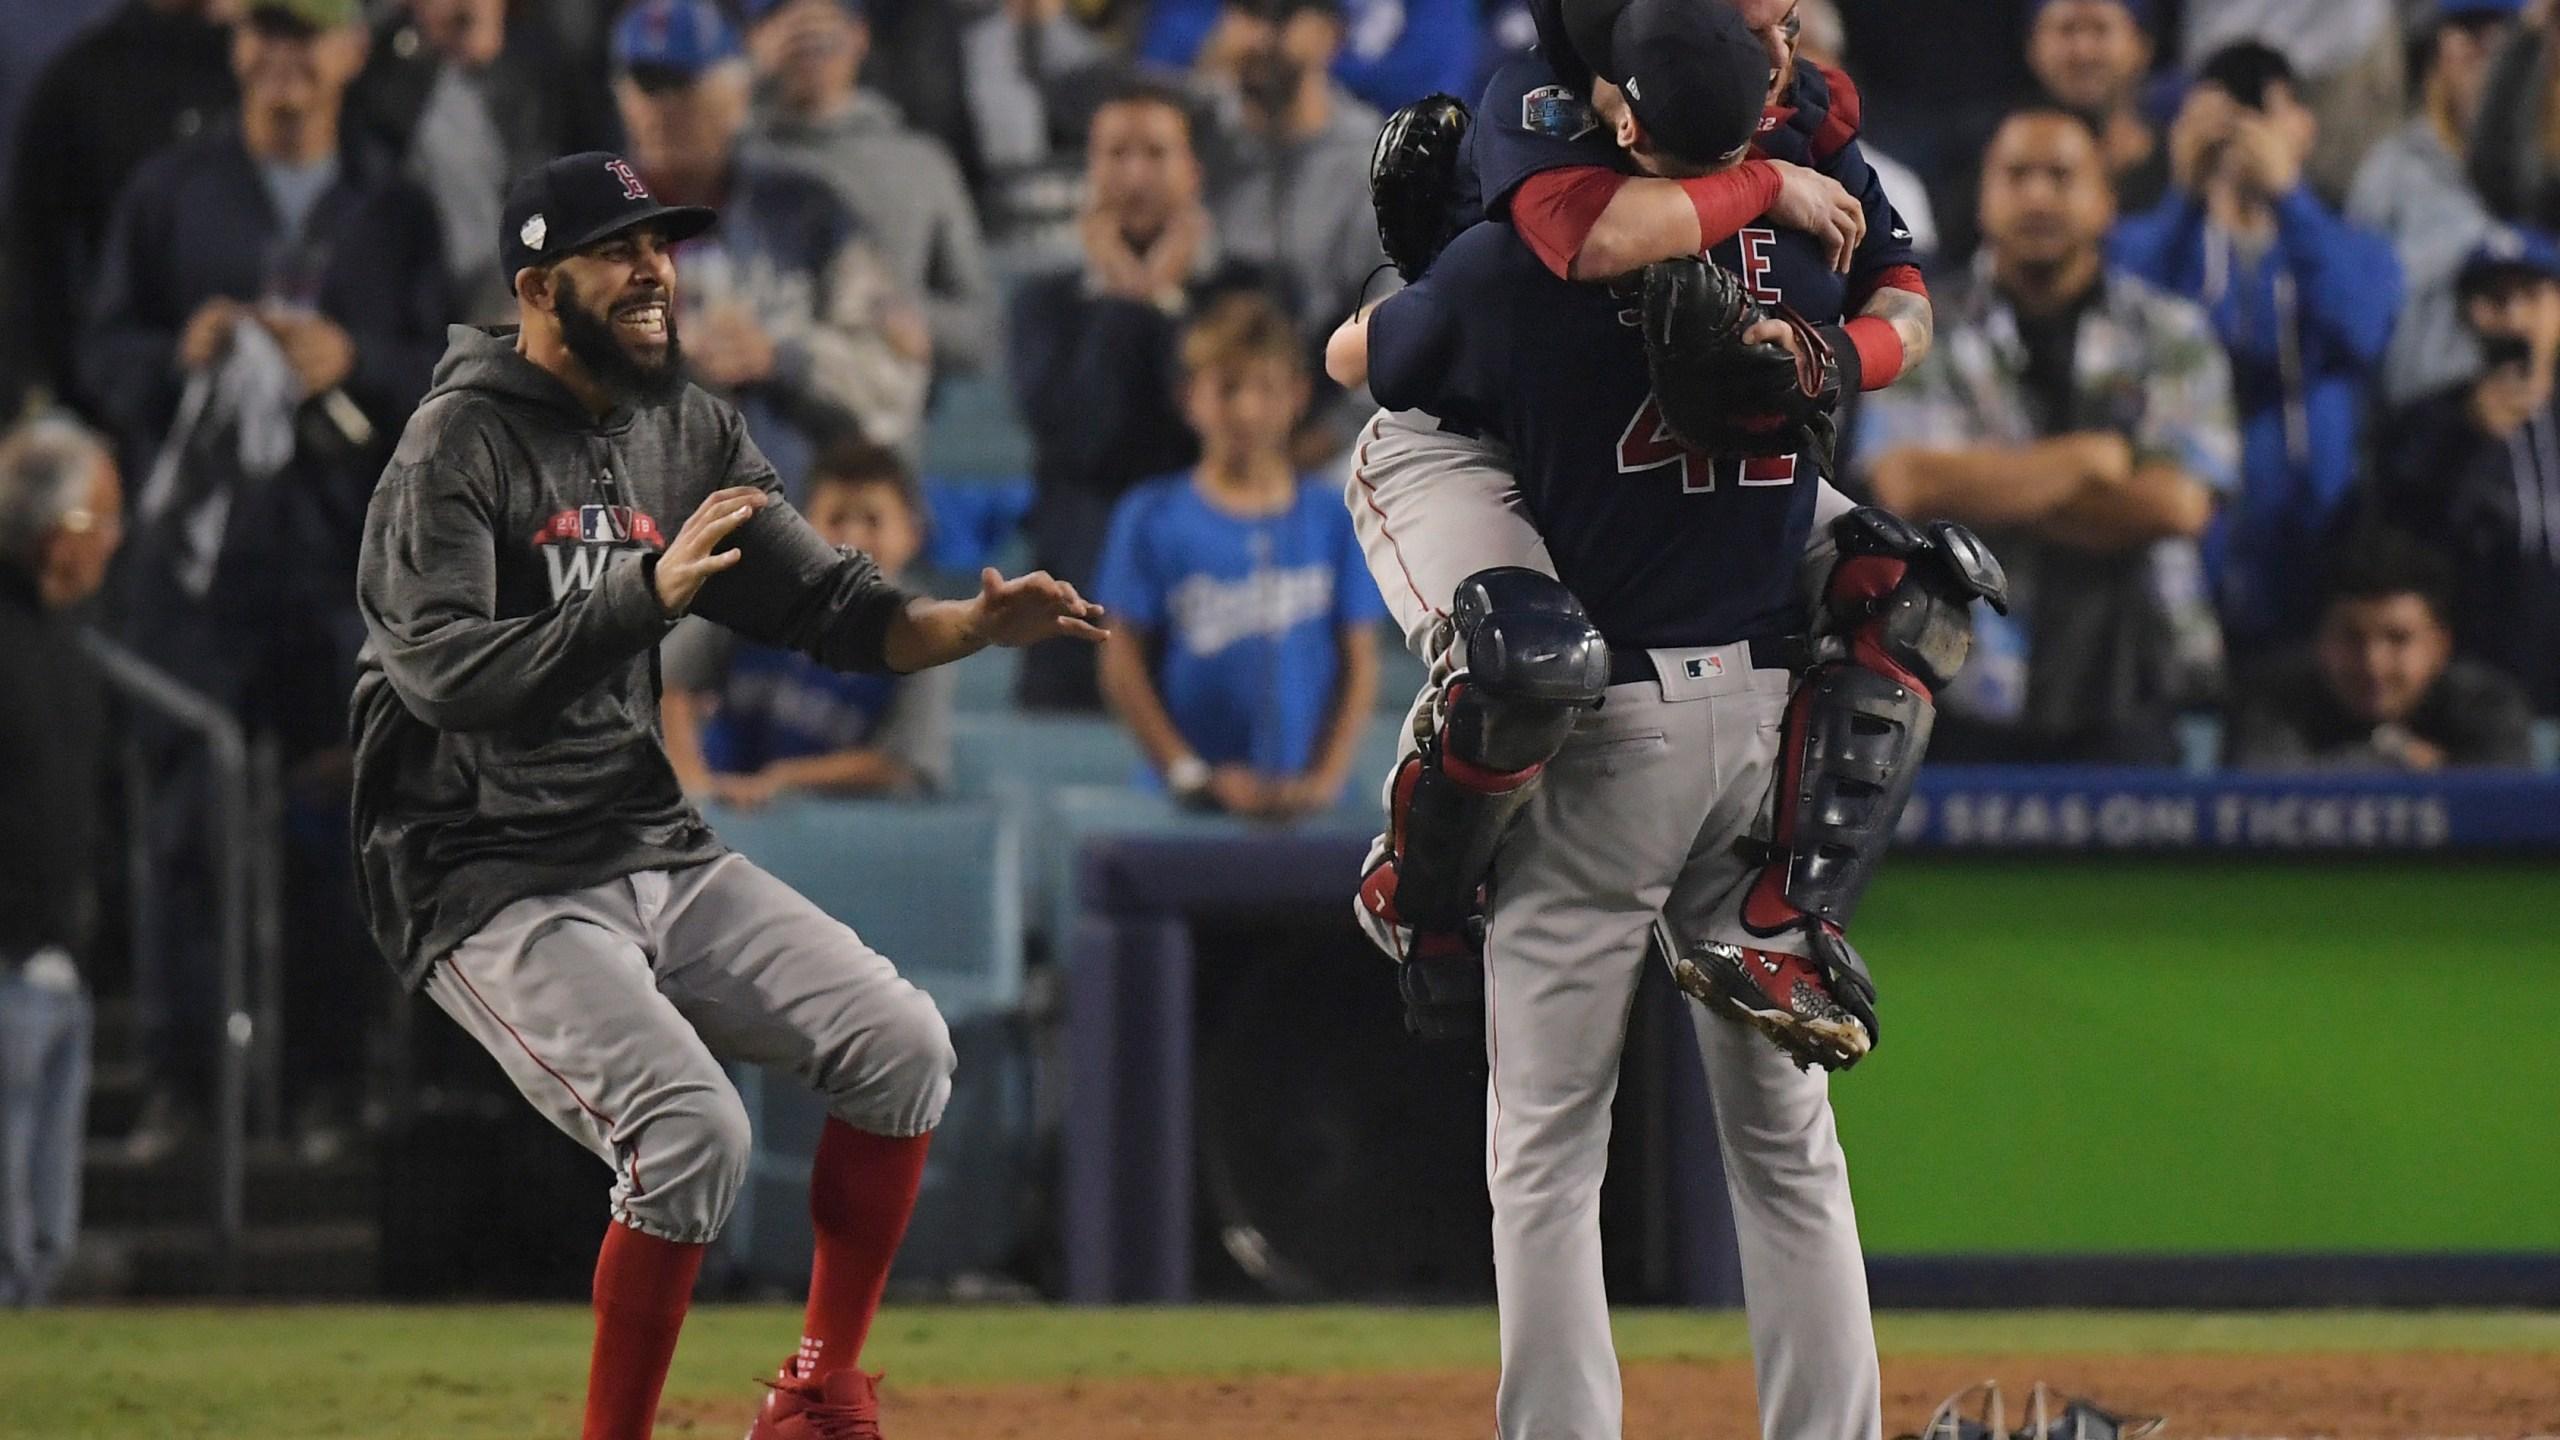 APTOPIX World Series Red Sox Dodgers Baseball_1540784577089